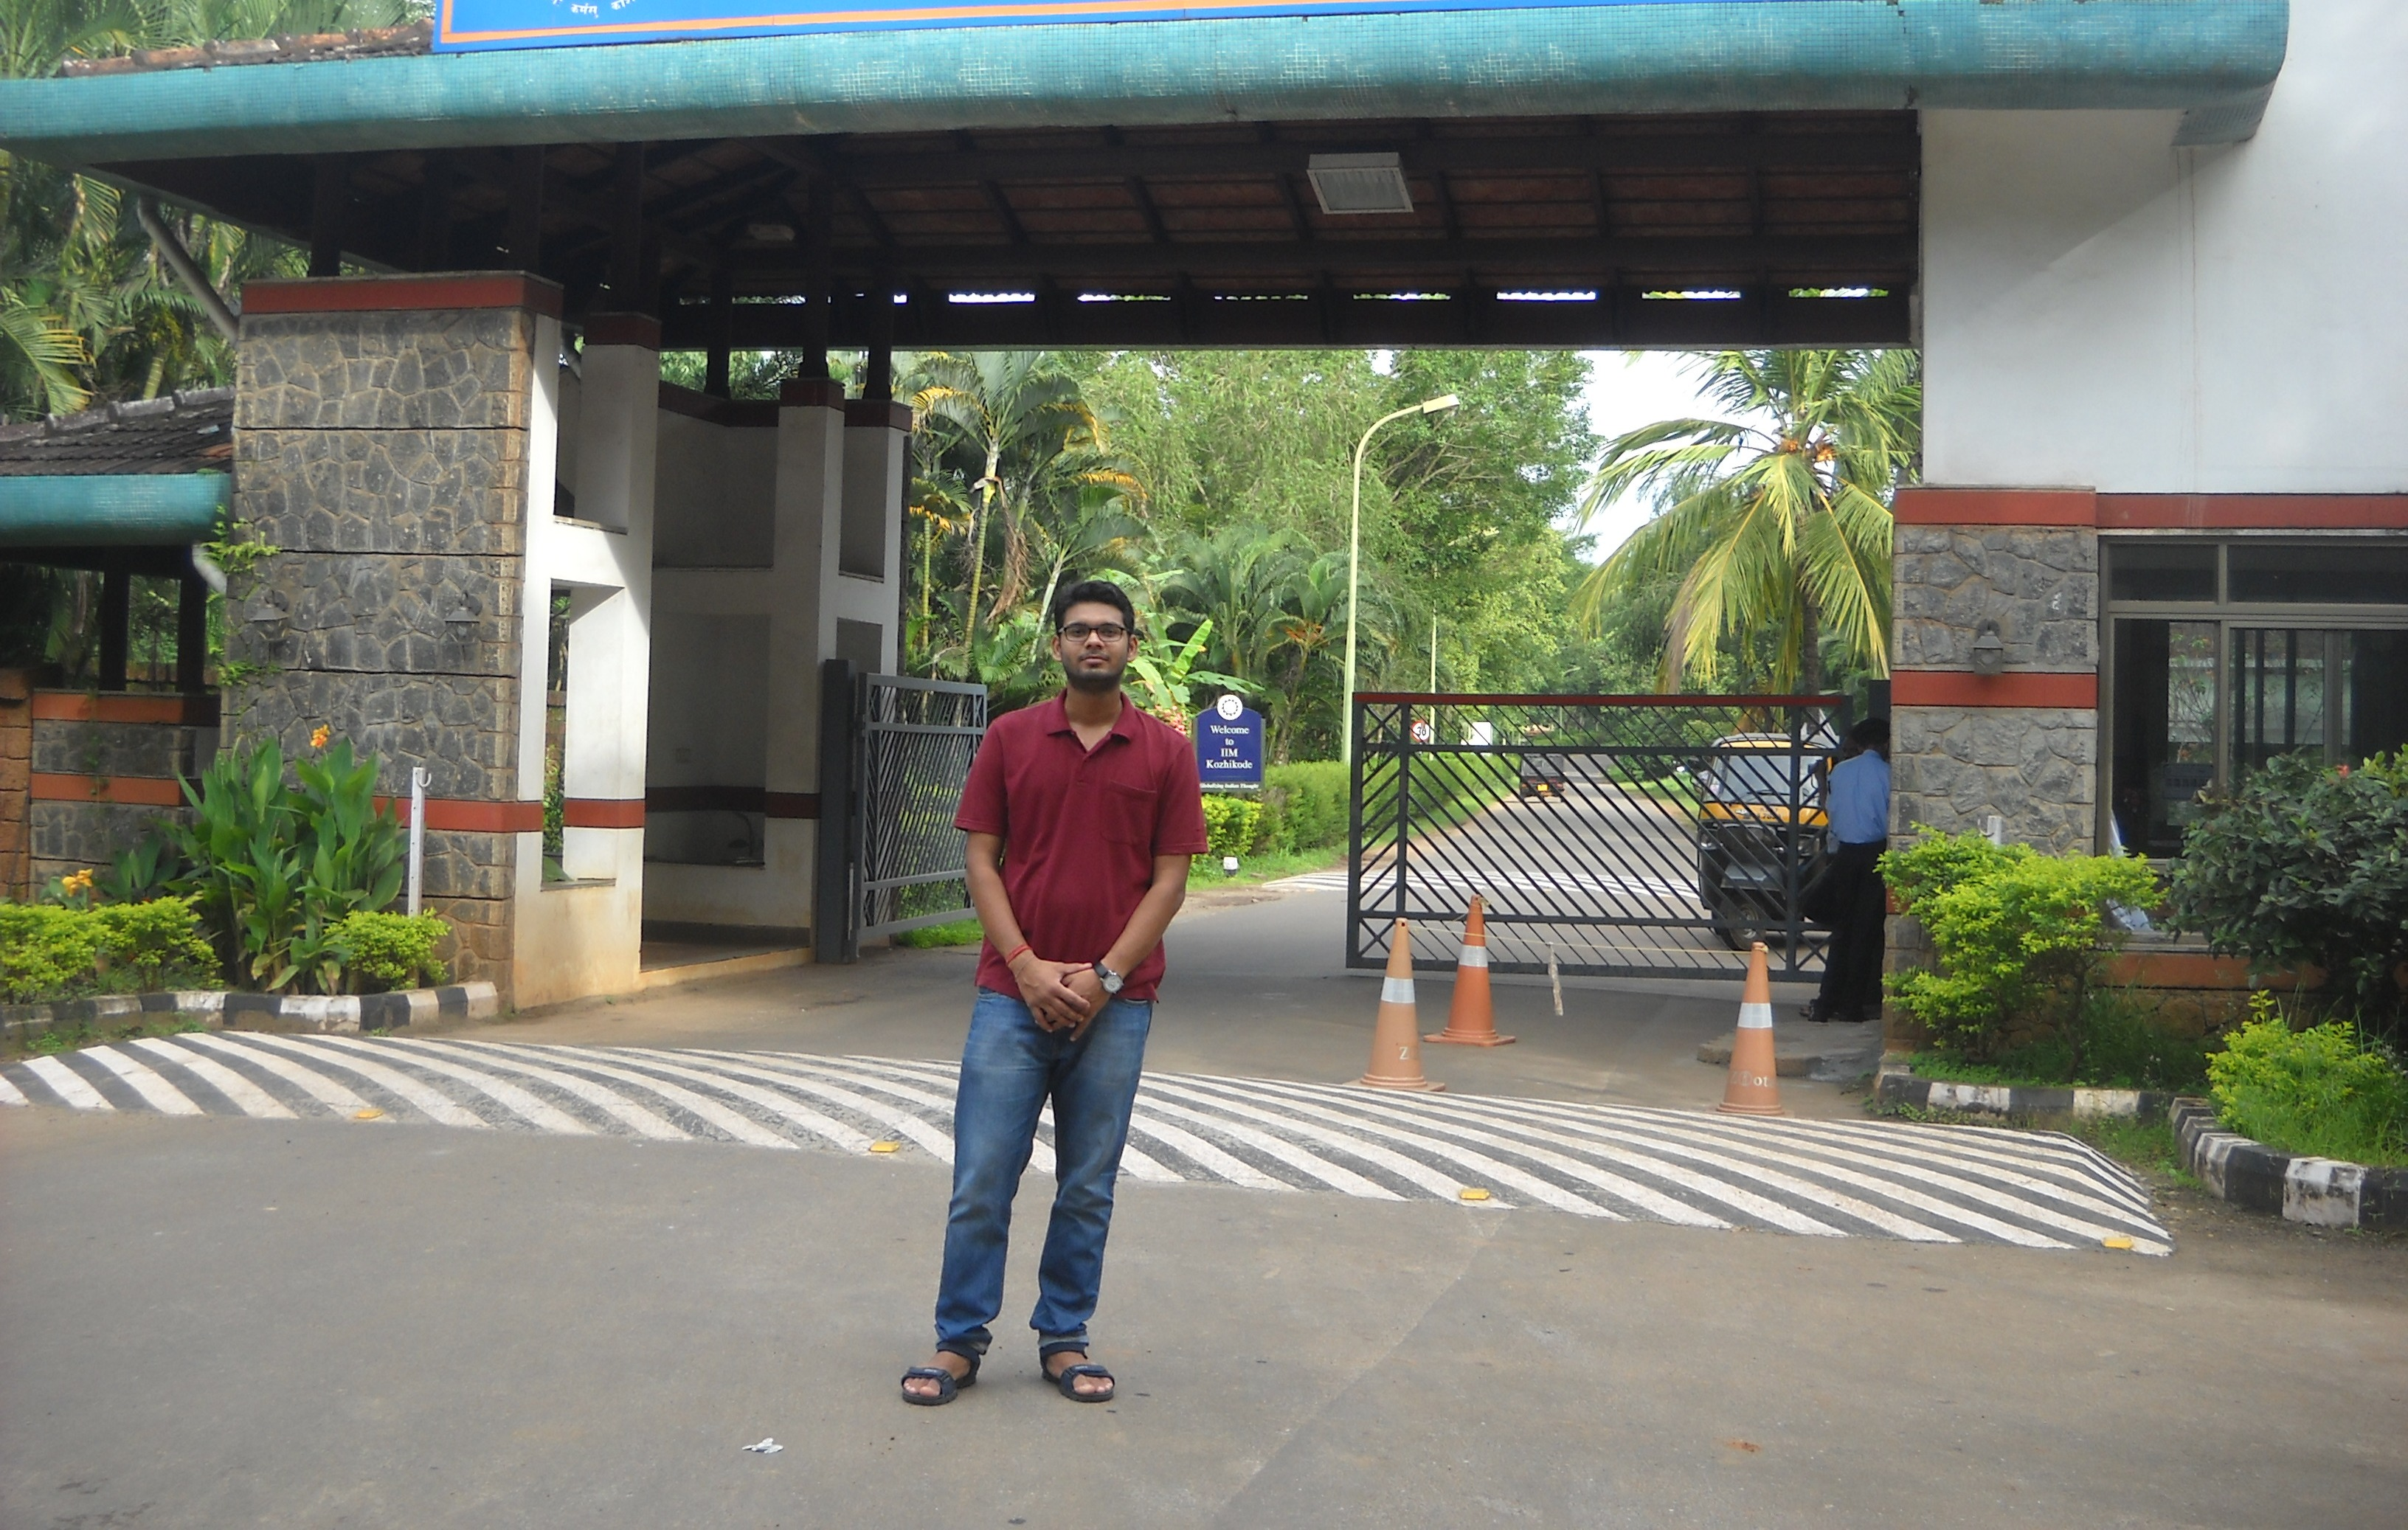 internship-at-iim-kozhikode-how-devesh-found-an-alternative-career-path